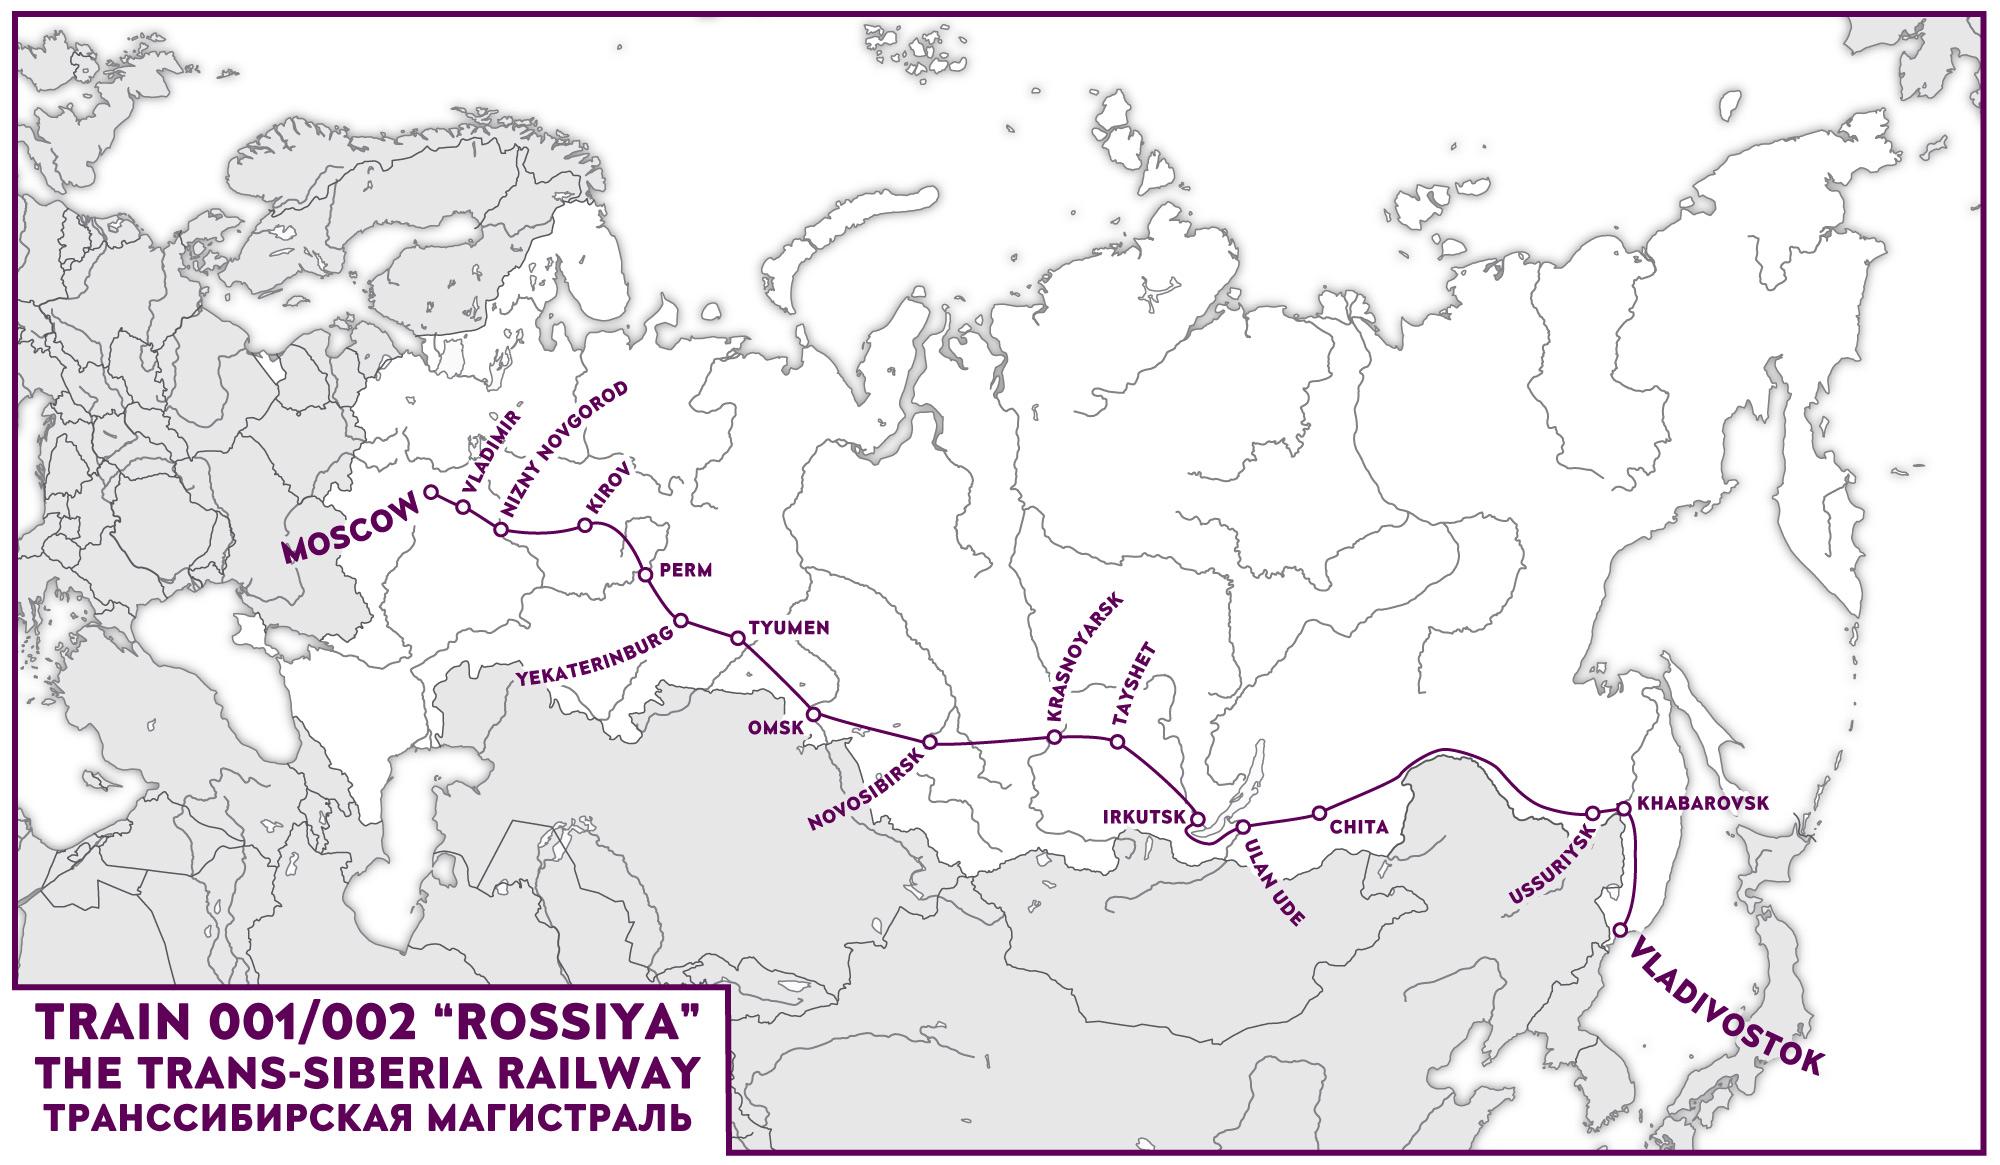 TranssiberiaRailway